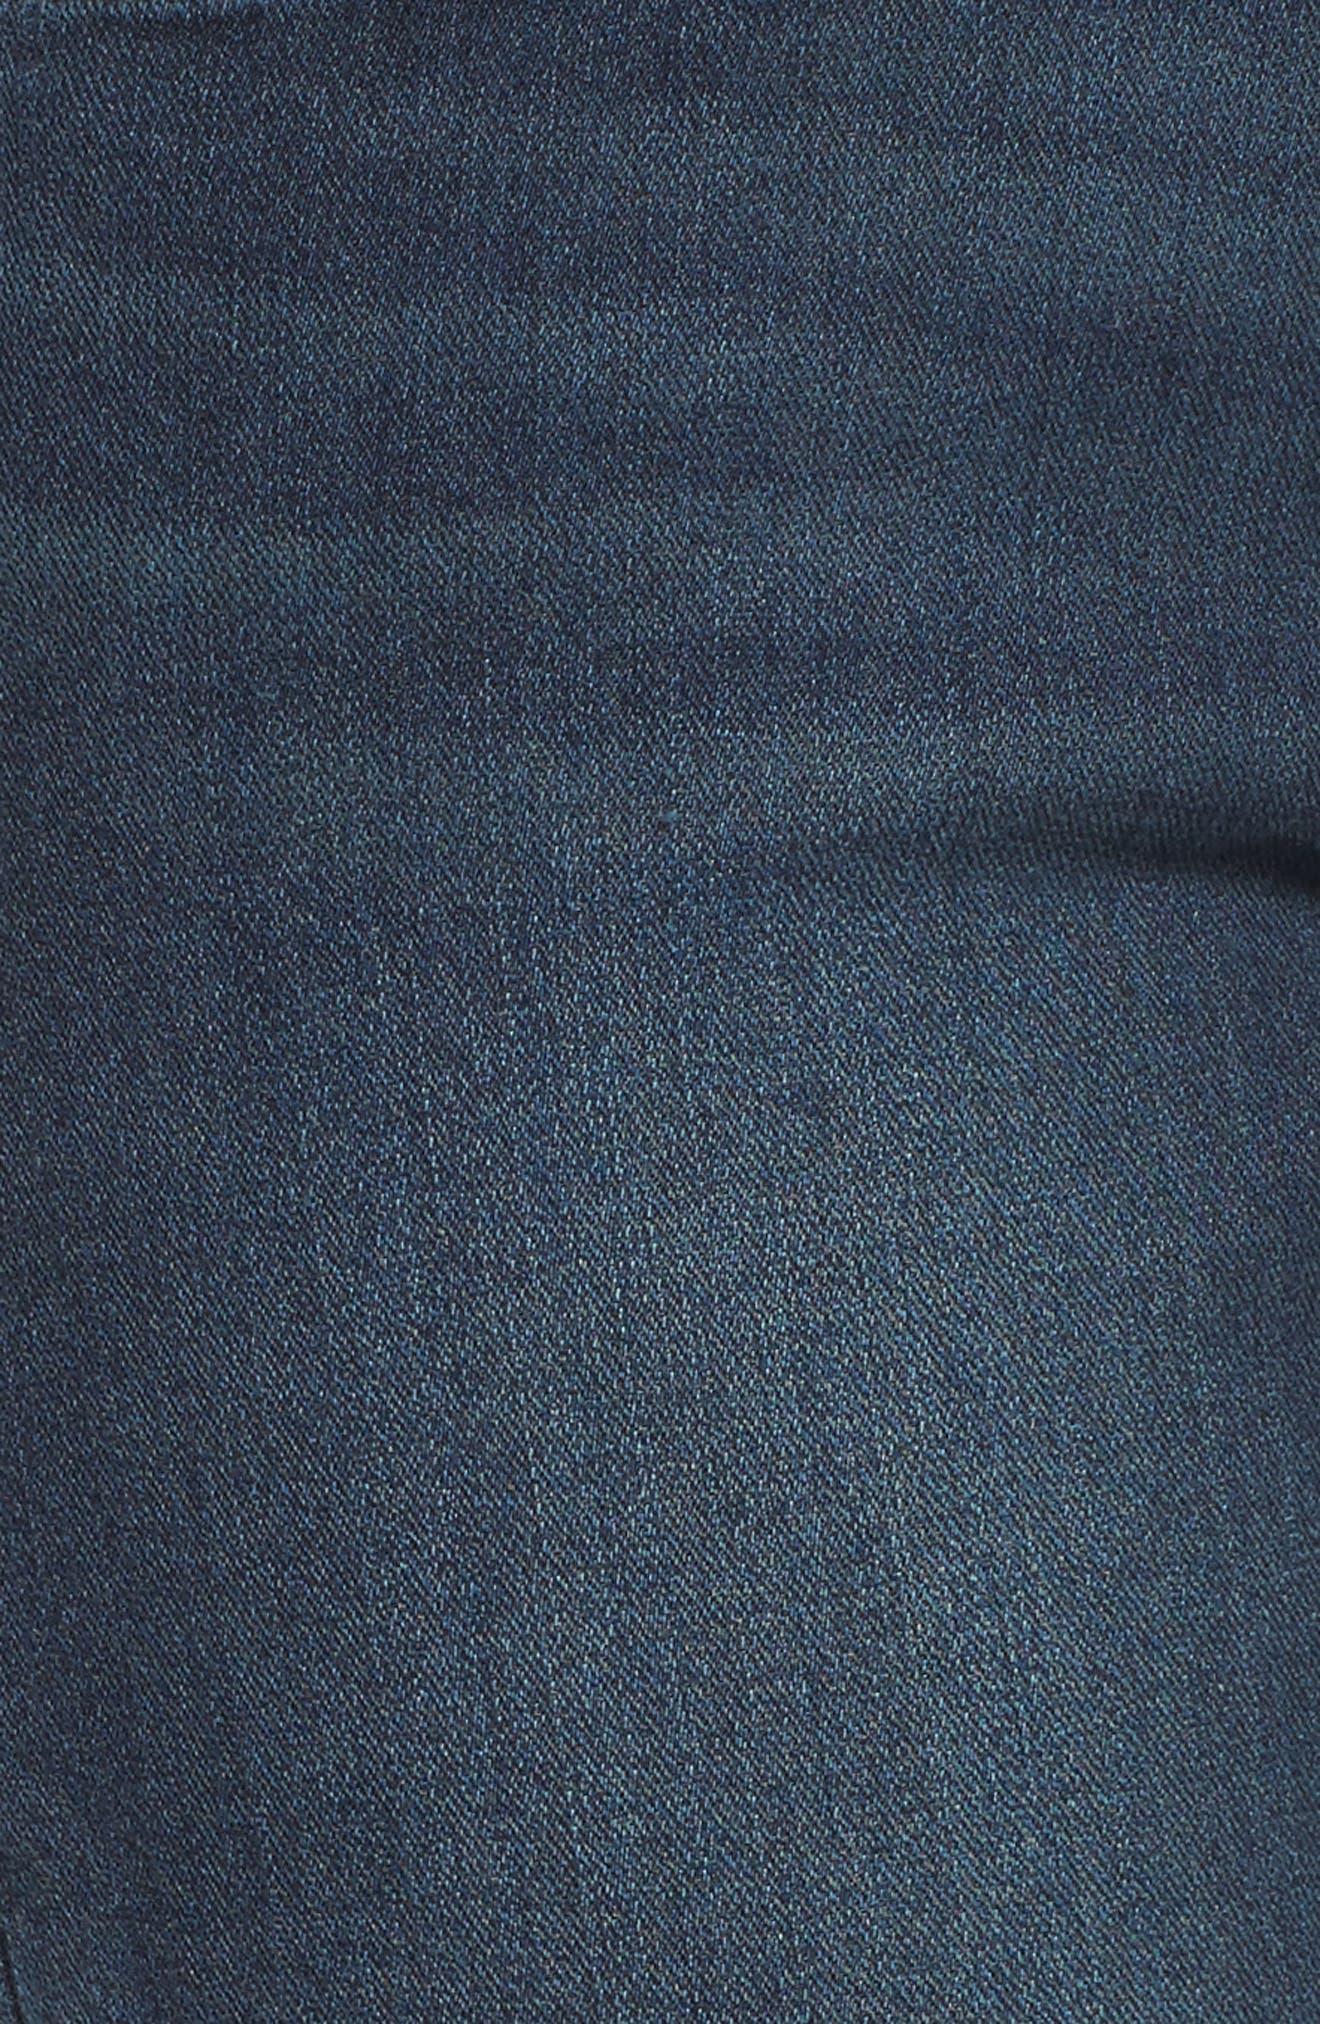 Alternate Image 5  - Leith Skinny Jeans (Medium Wash)